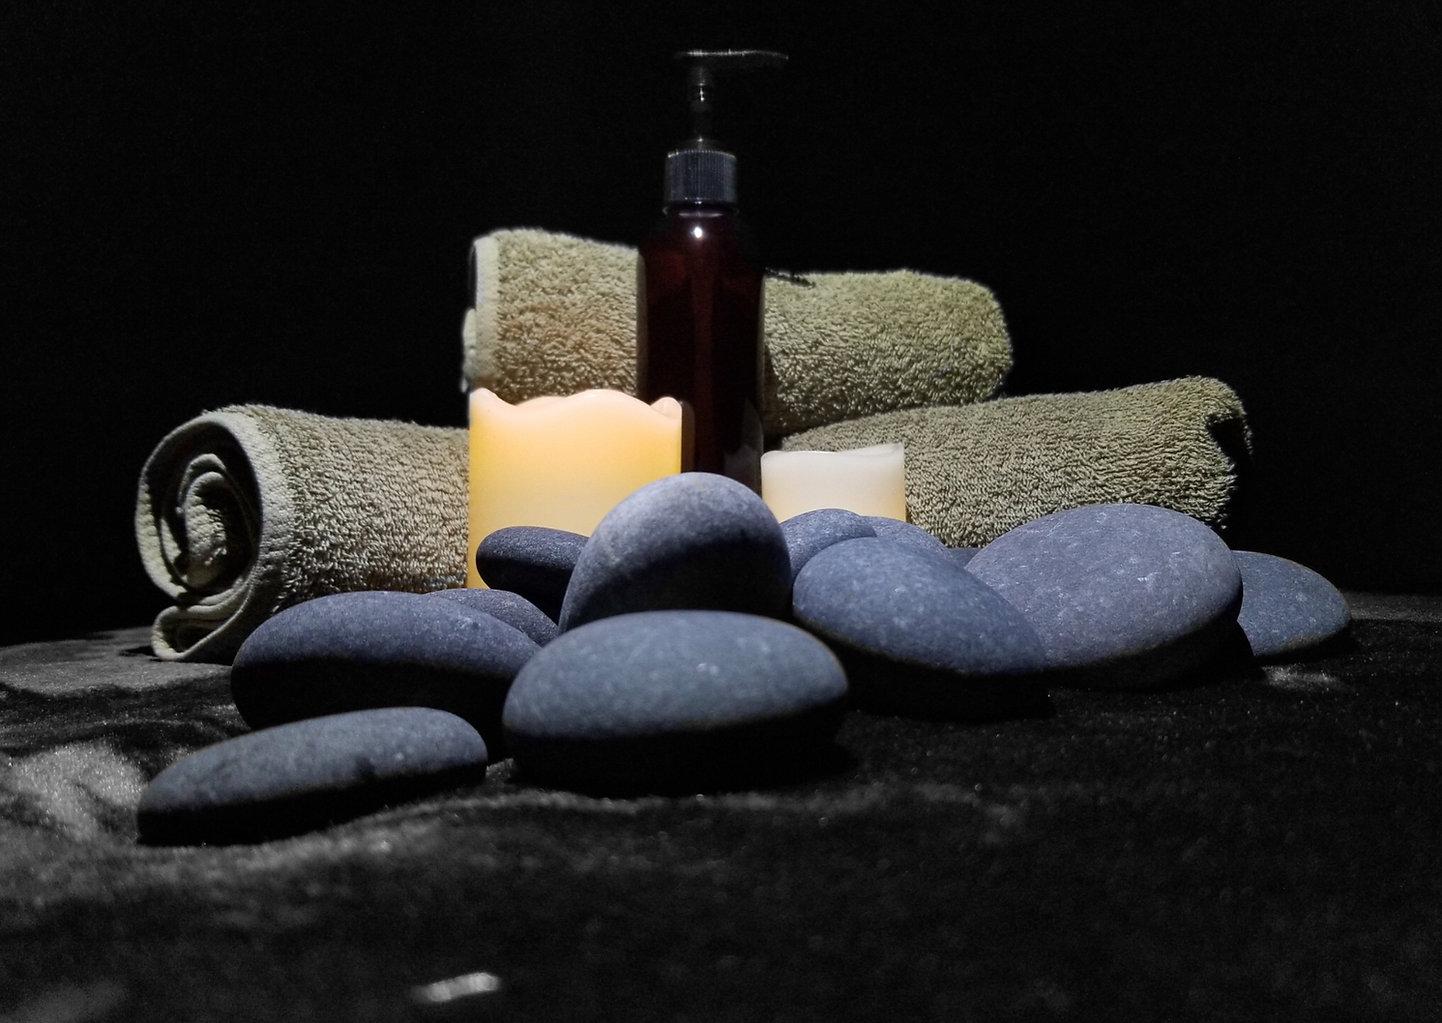 Low lit candles, fresh towels, massage oil for men's massage at Men's Den, Inc.